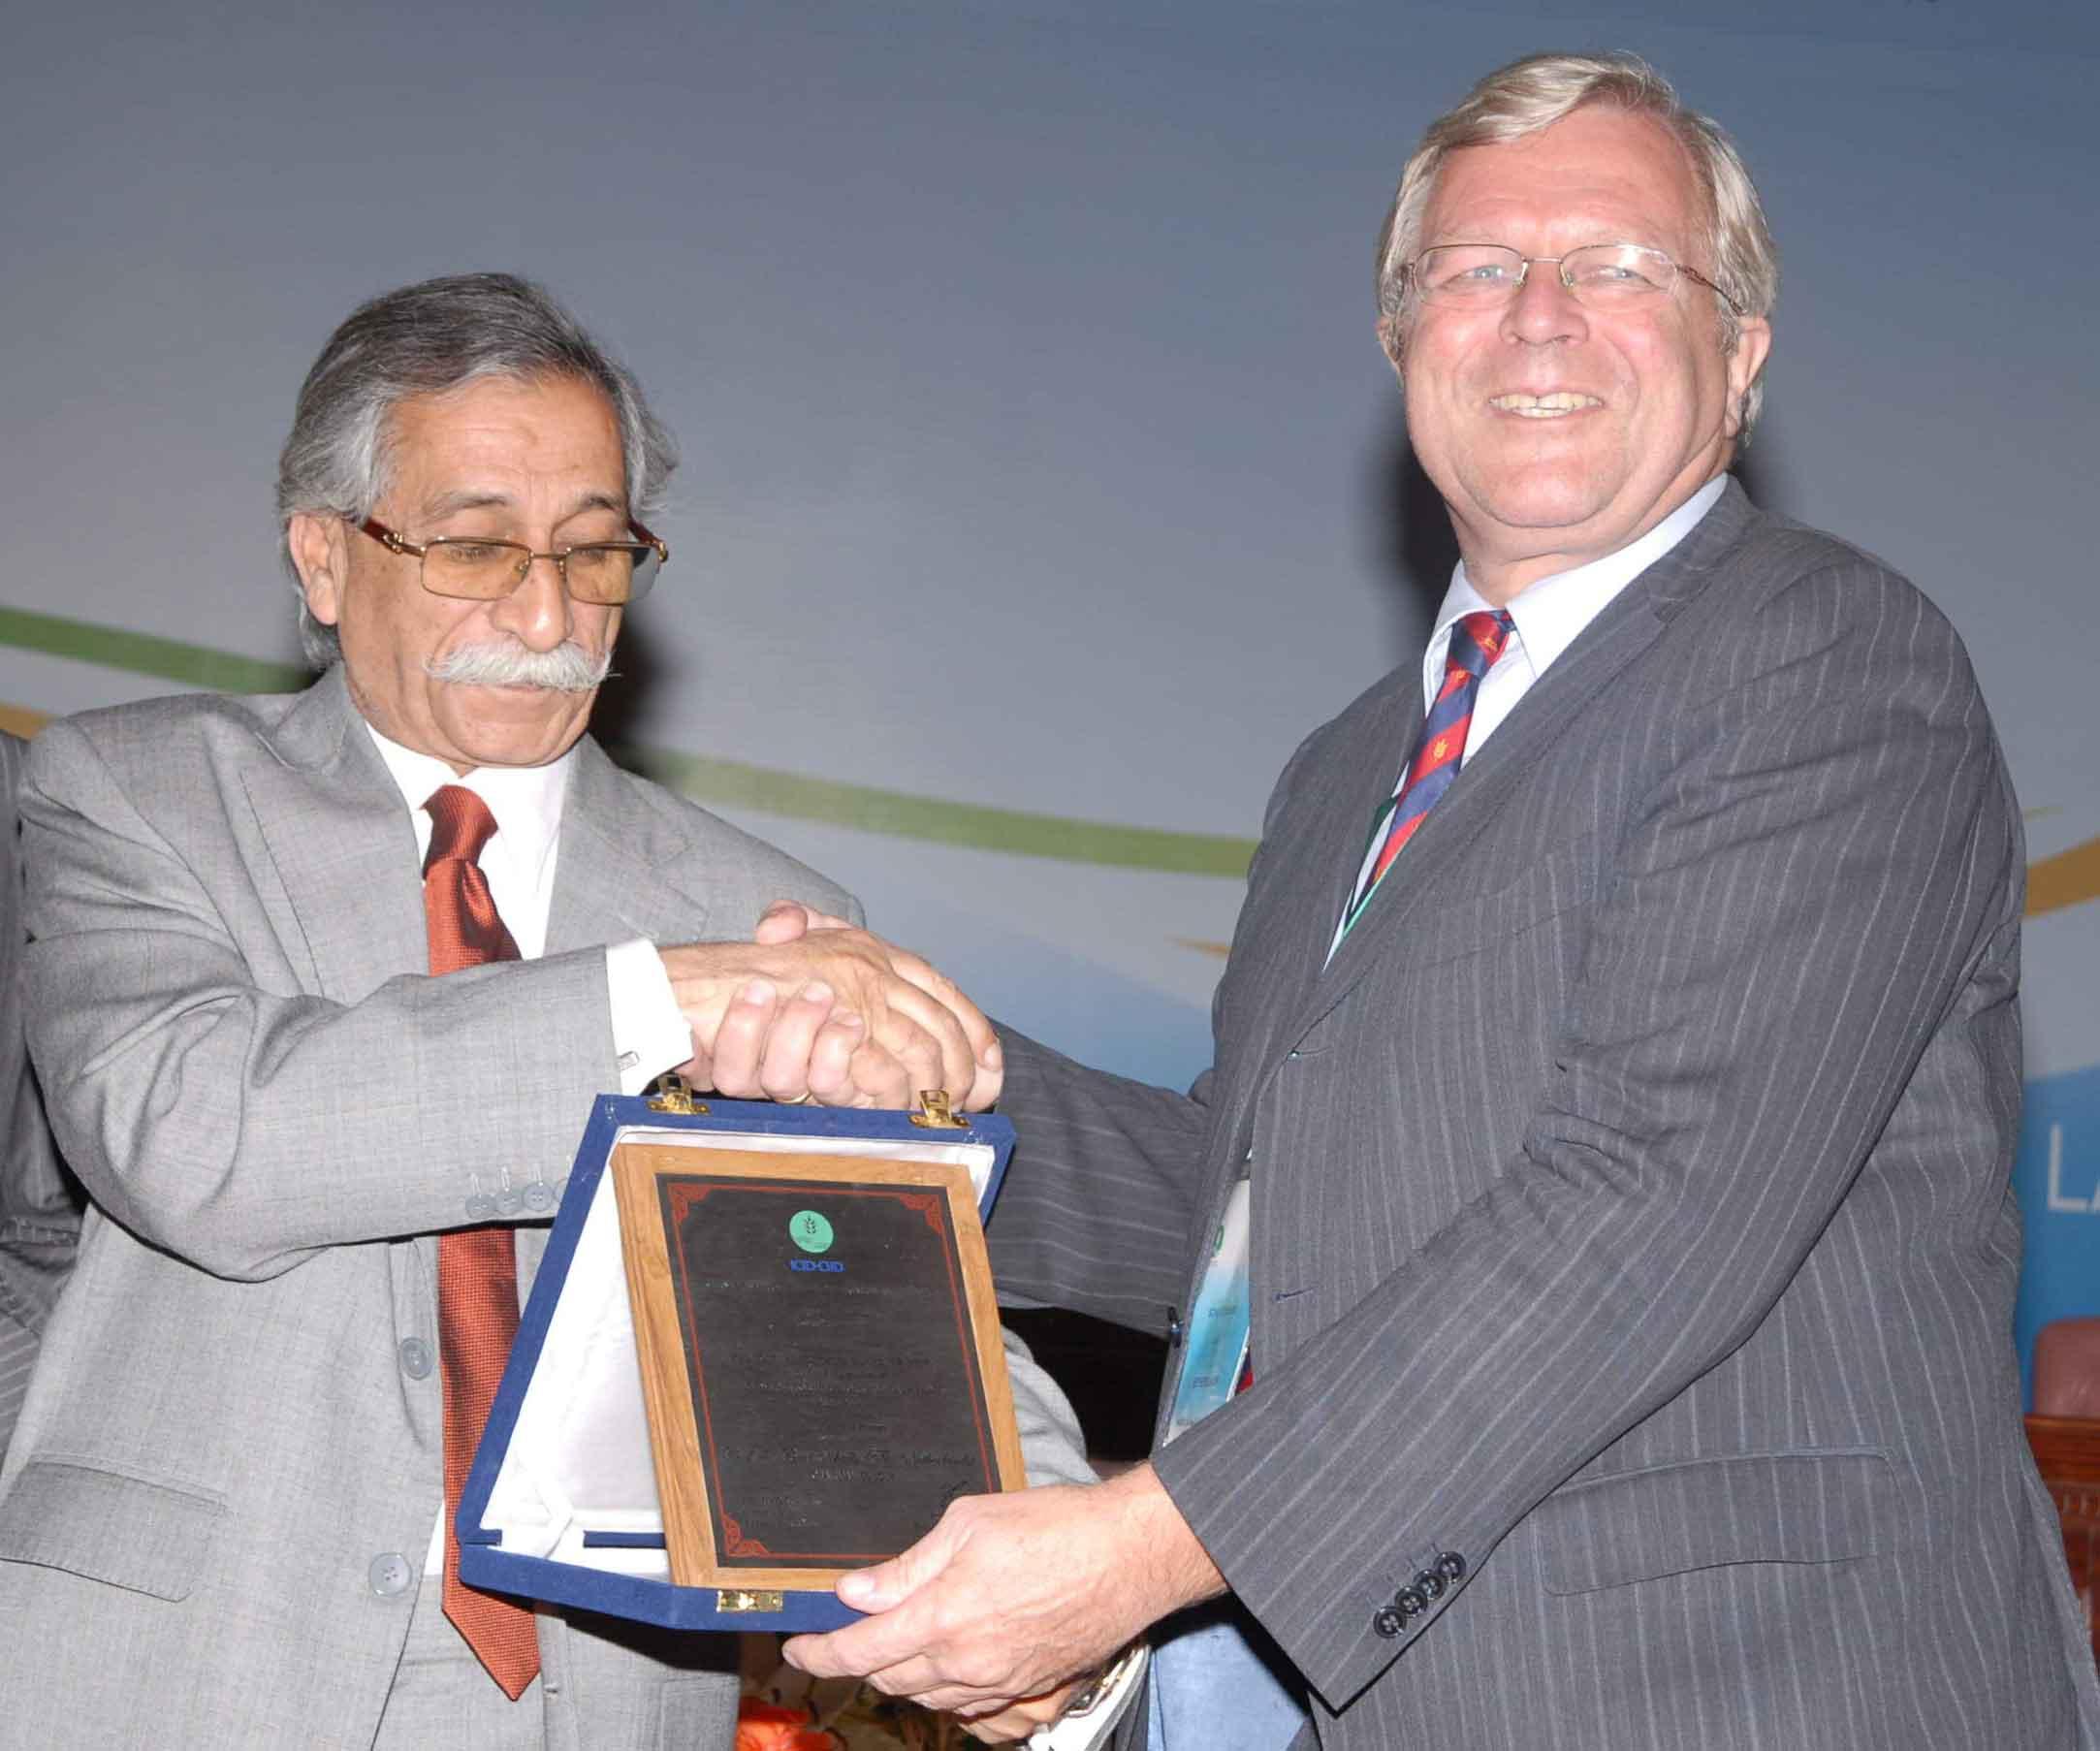 EB-JOUR Award